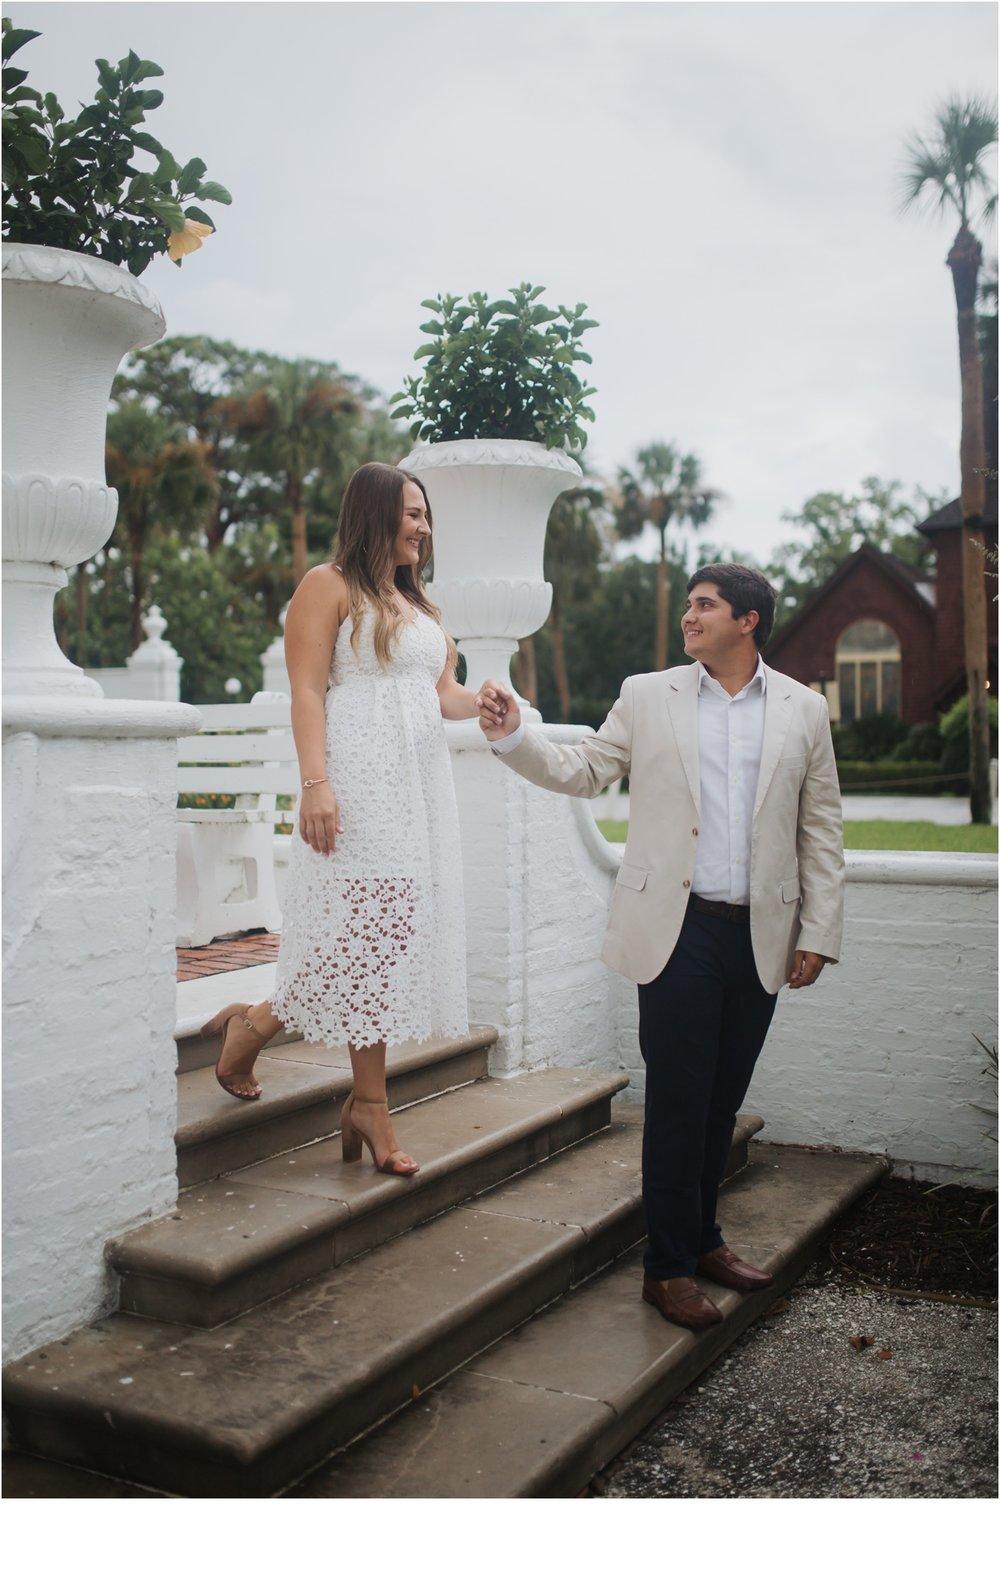 Rainey_Gregg_Photography_St._Simons_Island_Georgia_California_Wedding_Portrait_Photography_1129.jpg